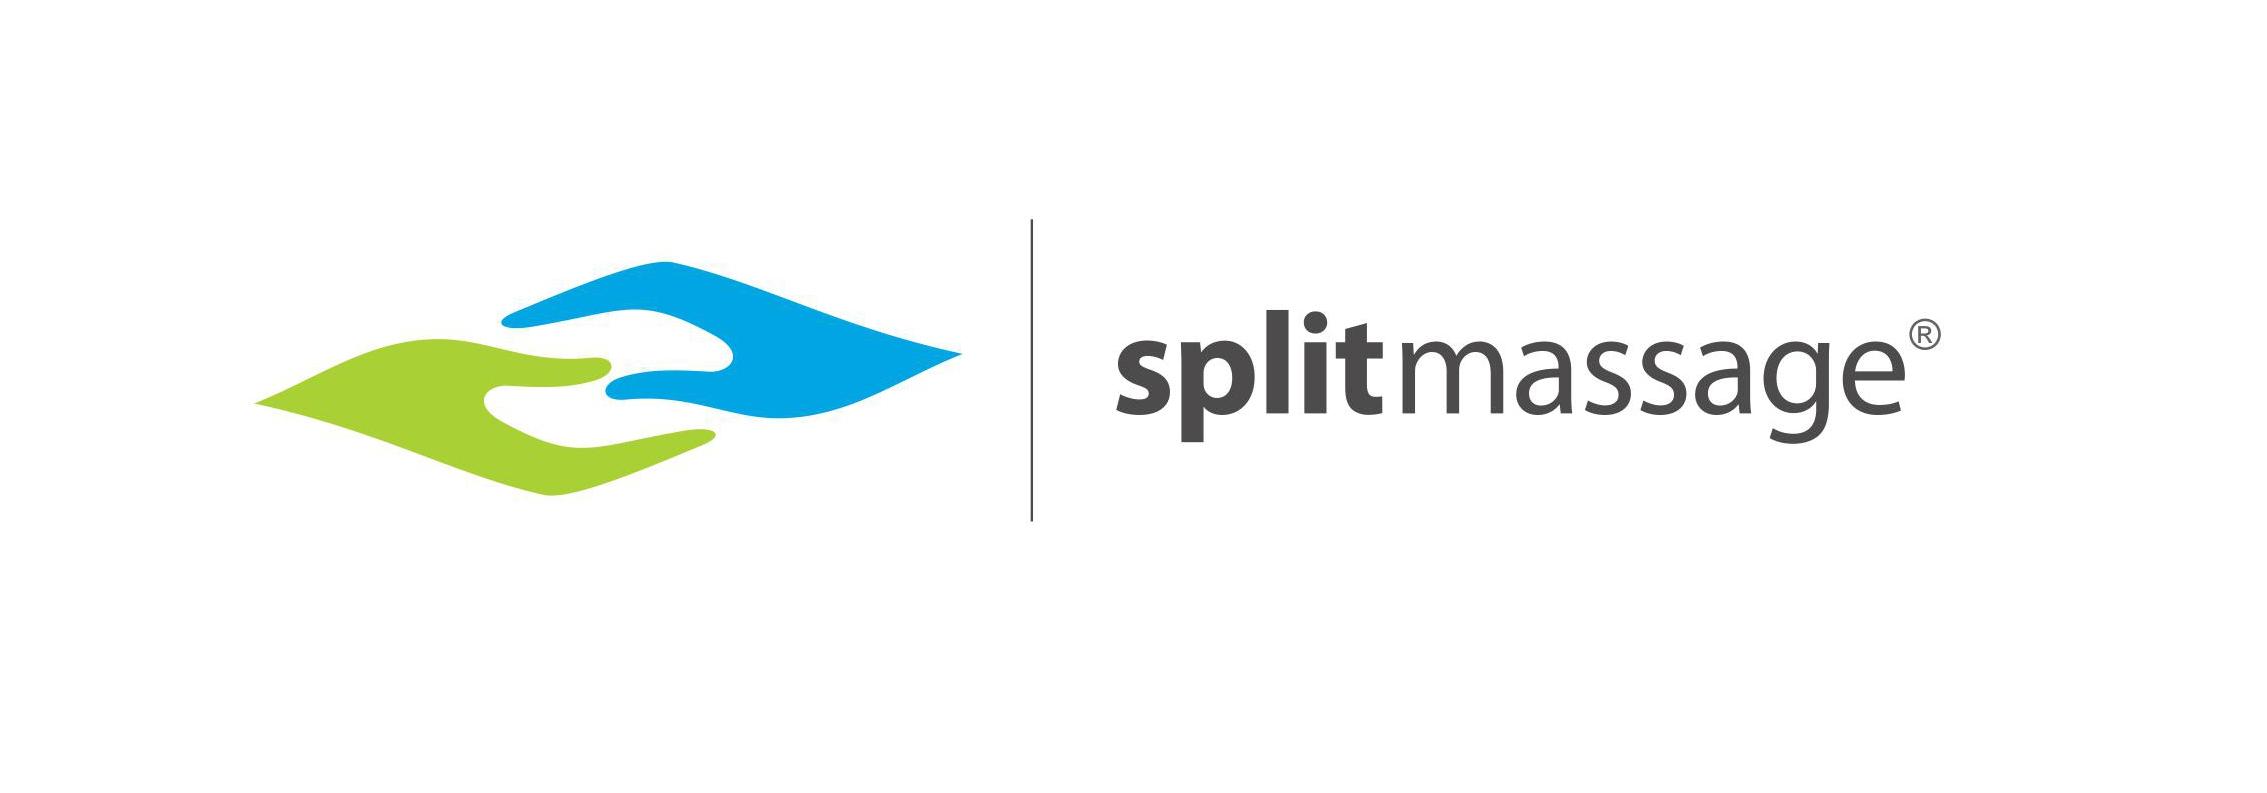 Партнеры конкурса SPLIT Massage